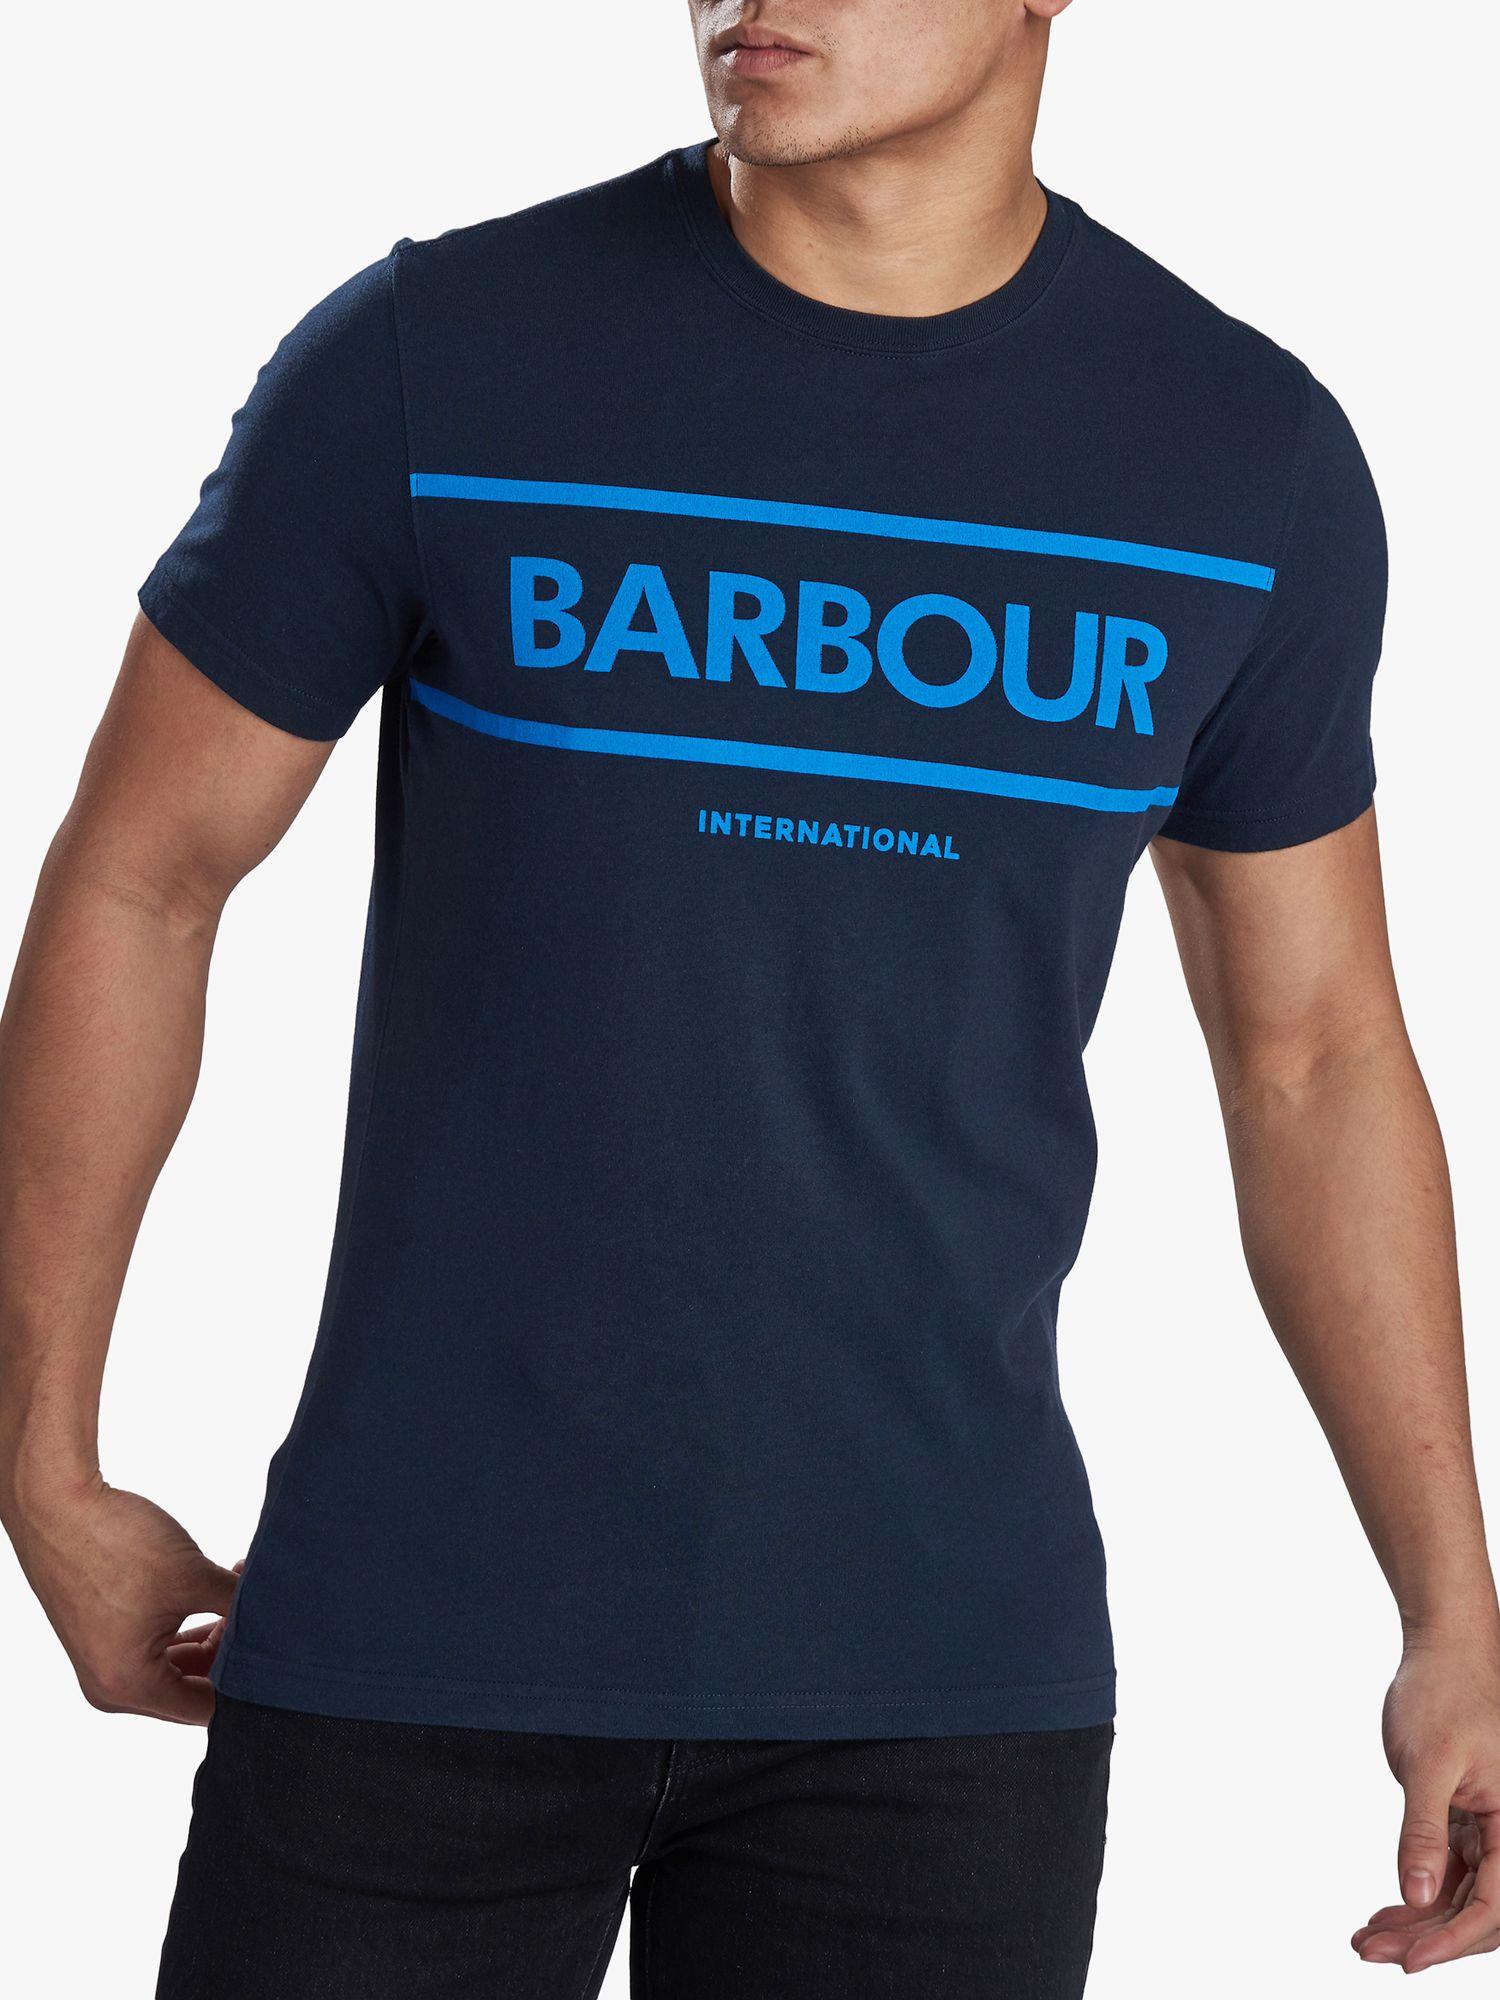 barbour t shirt mens